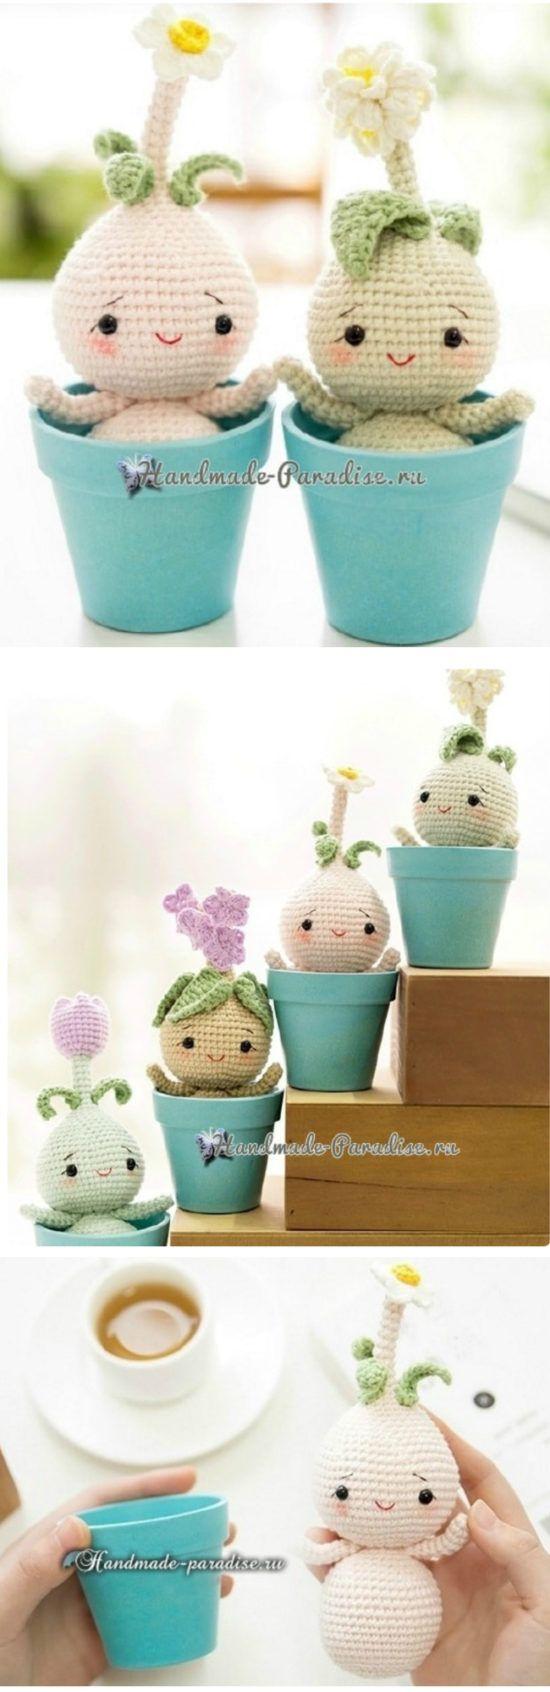 Crochet Dolls Patterns Amigurumi Easy Video Tutorial | Ich freue ...